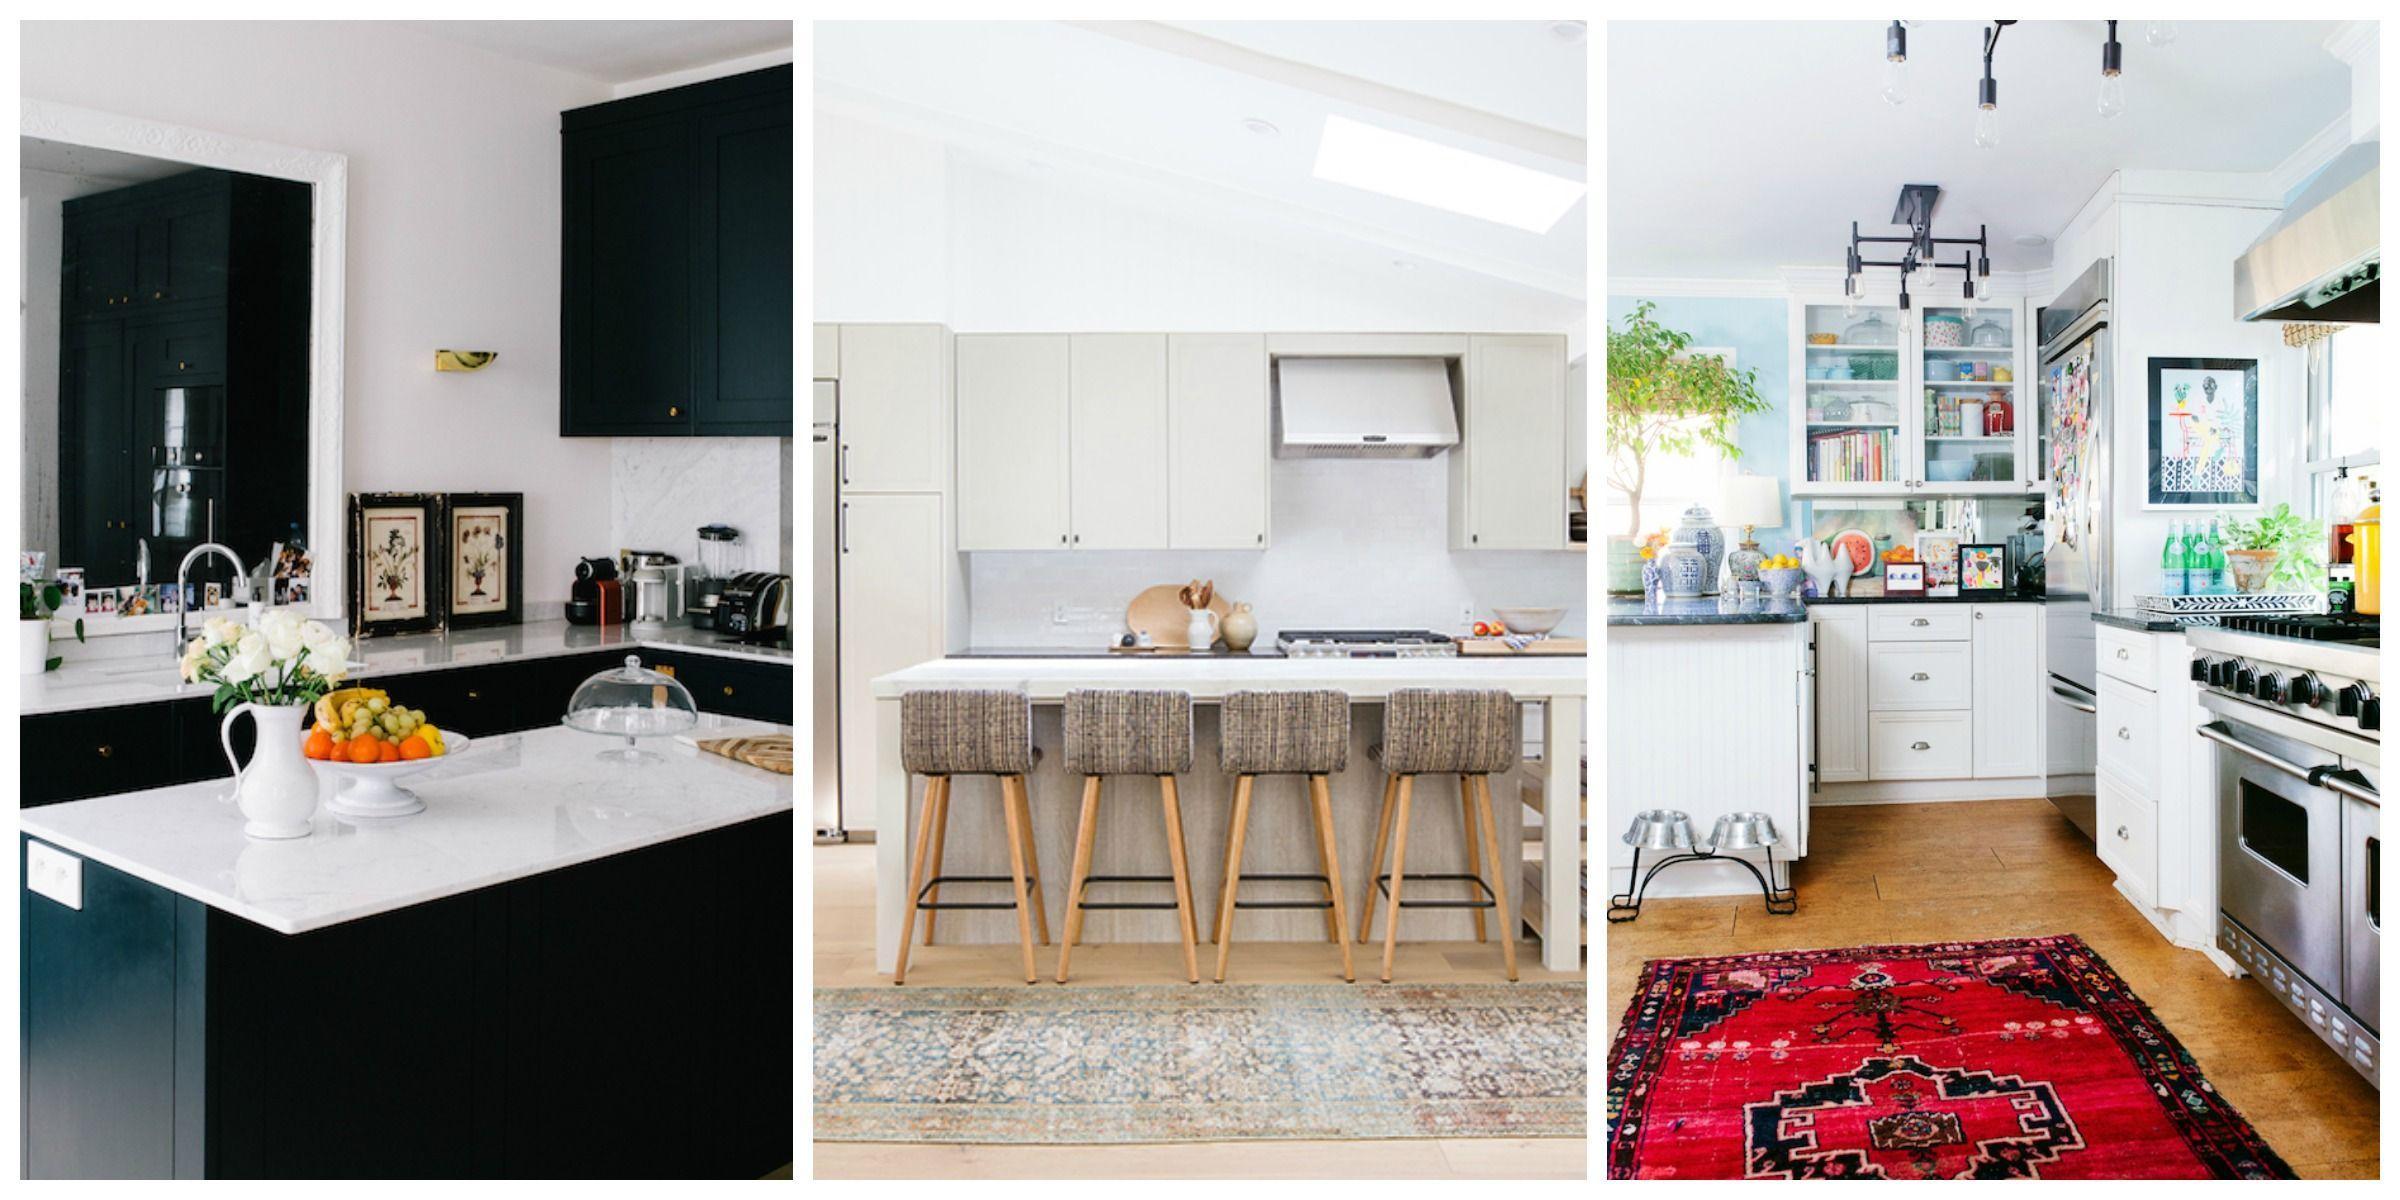 20 Stunning Kitchens - Gorgeous Kitchens